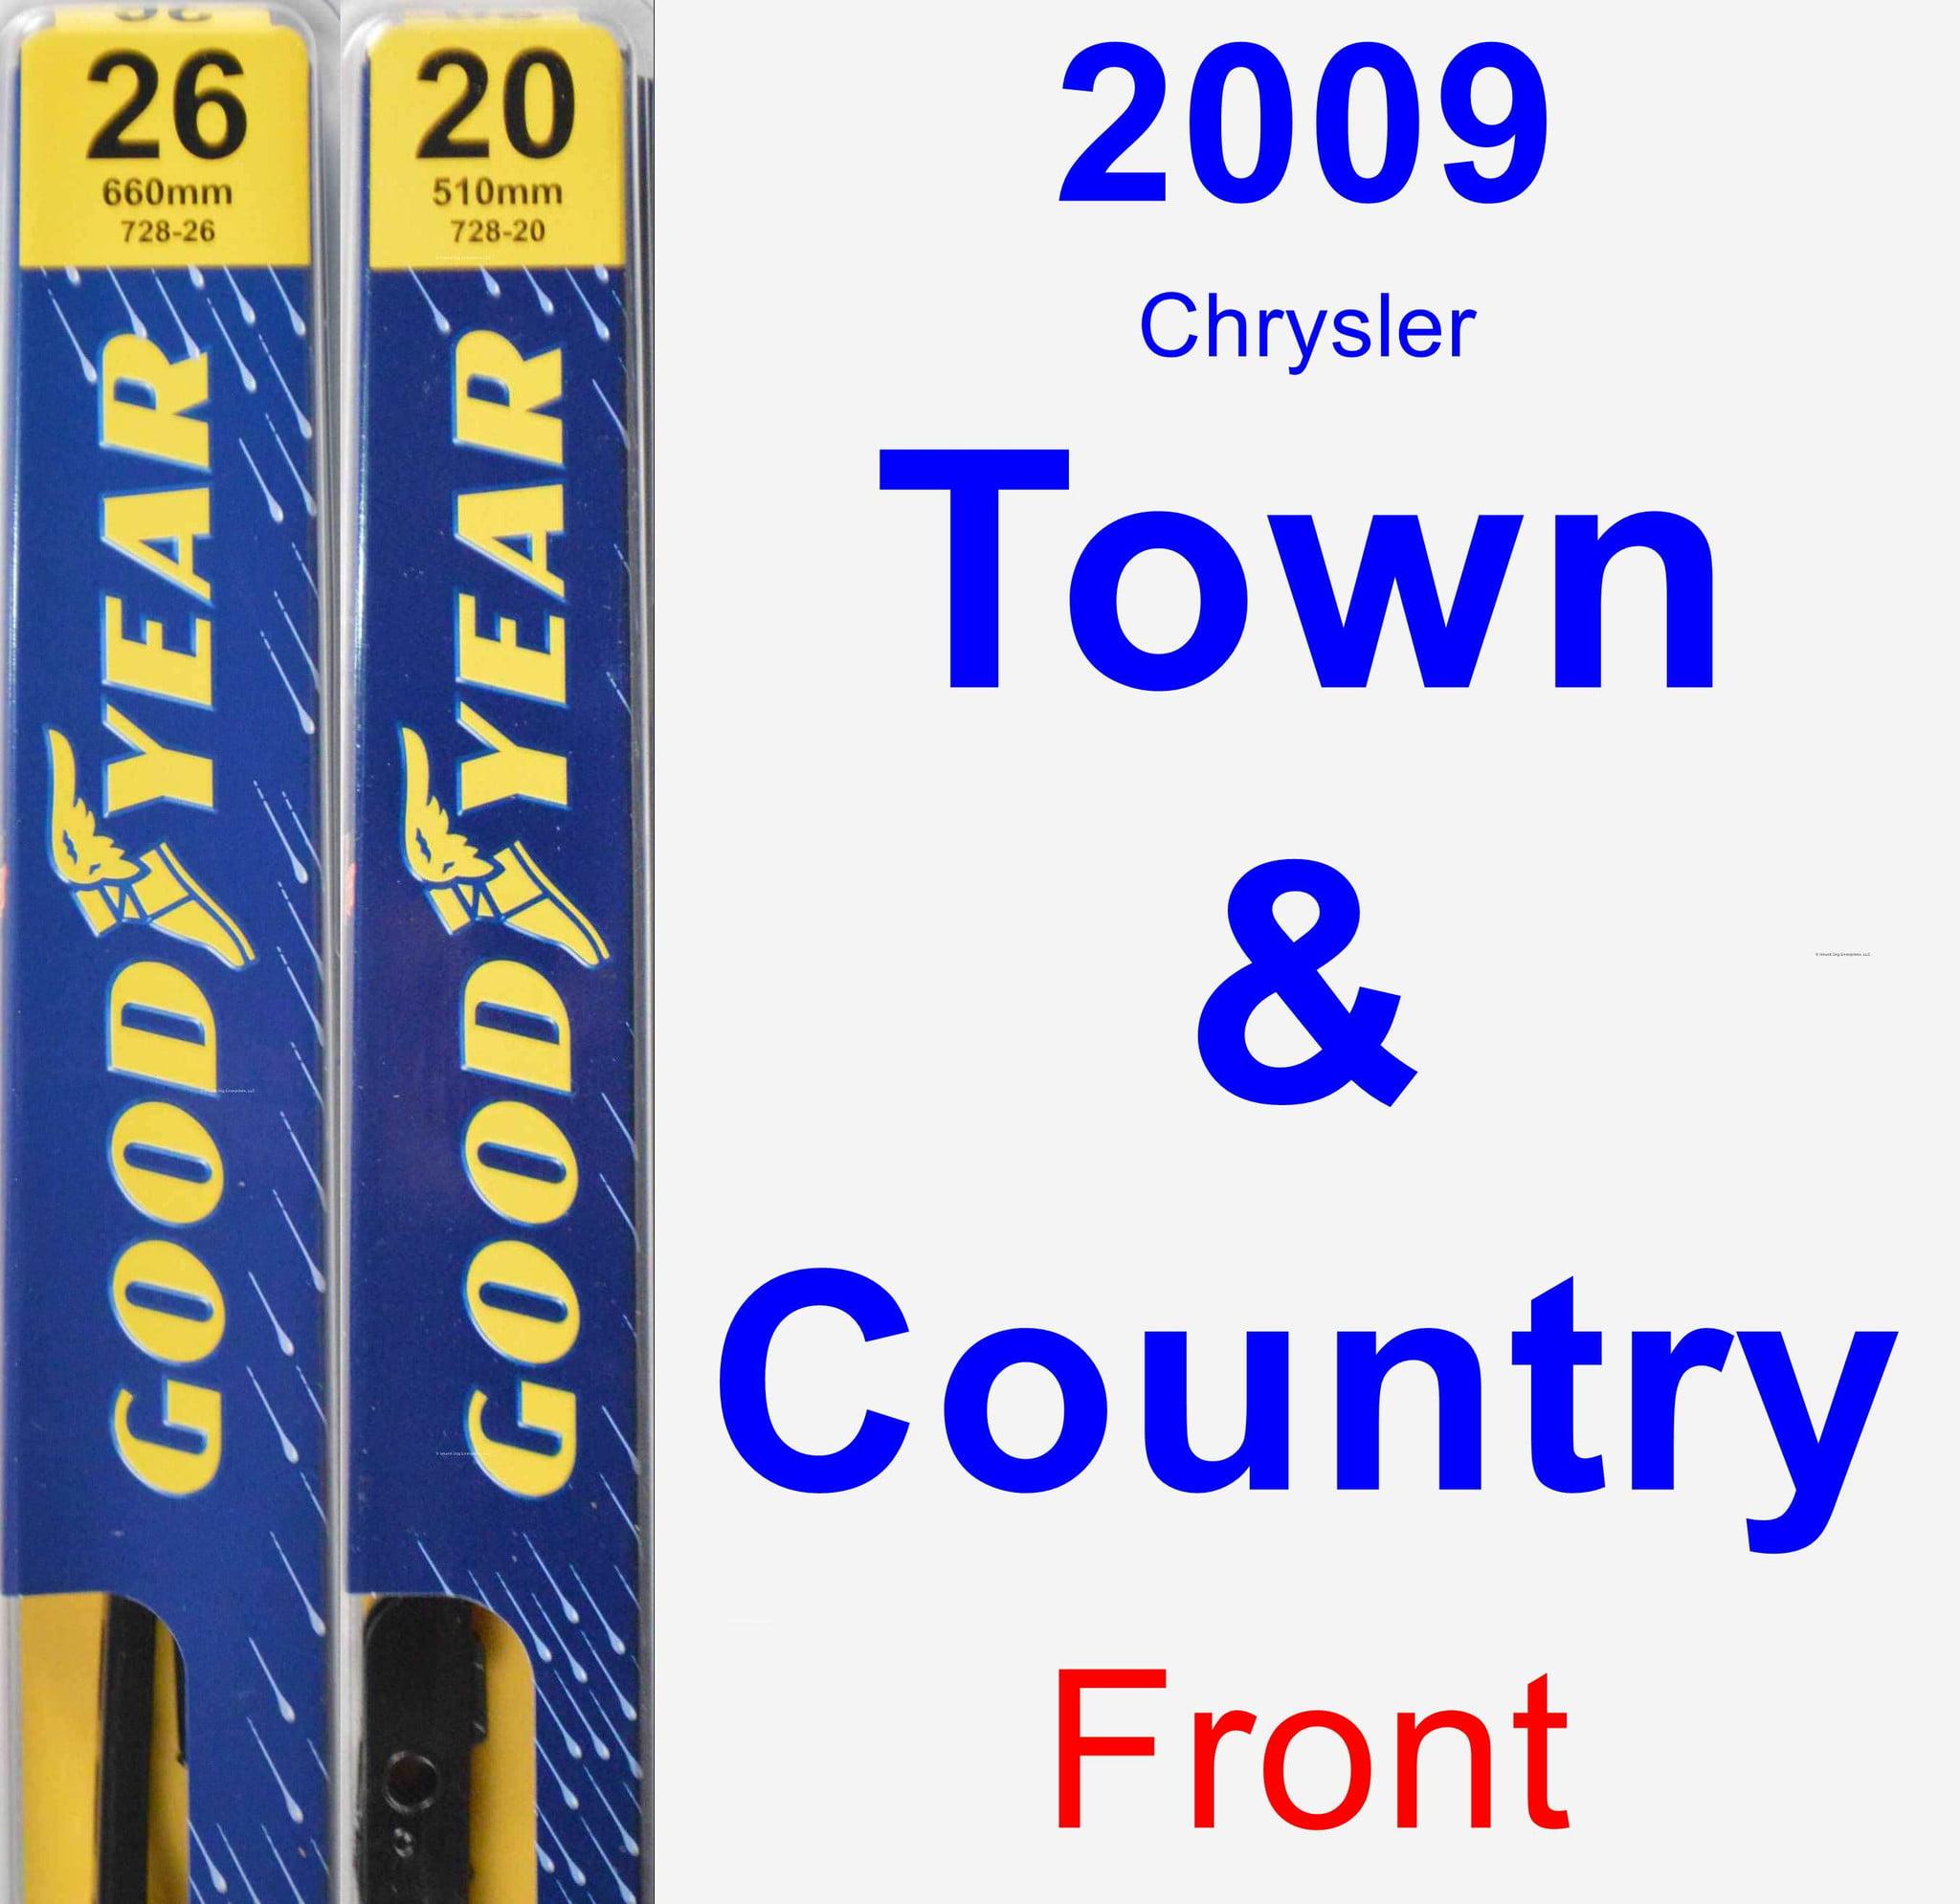 2009 Chrysler Town ; Country Wiper Blade Set/Kit (Front) (2 Blades) - Premium 728